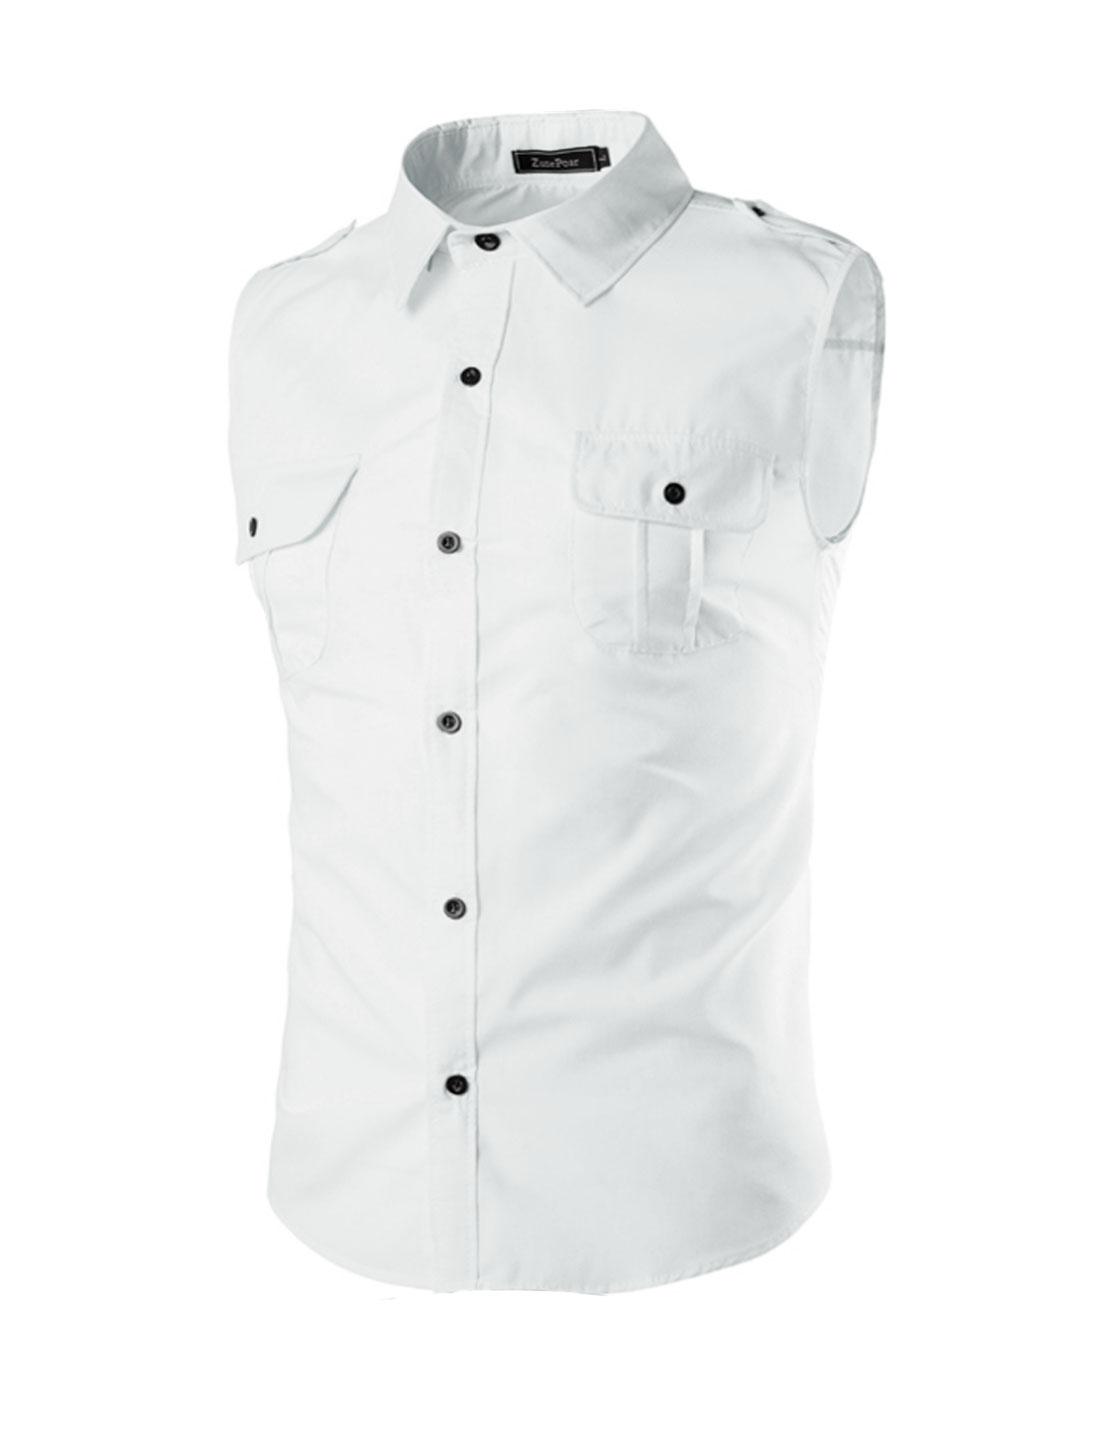 Men Flap Chest Pocket Button Closure Sleeveless Shirt White M